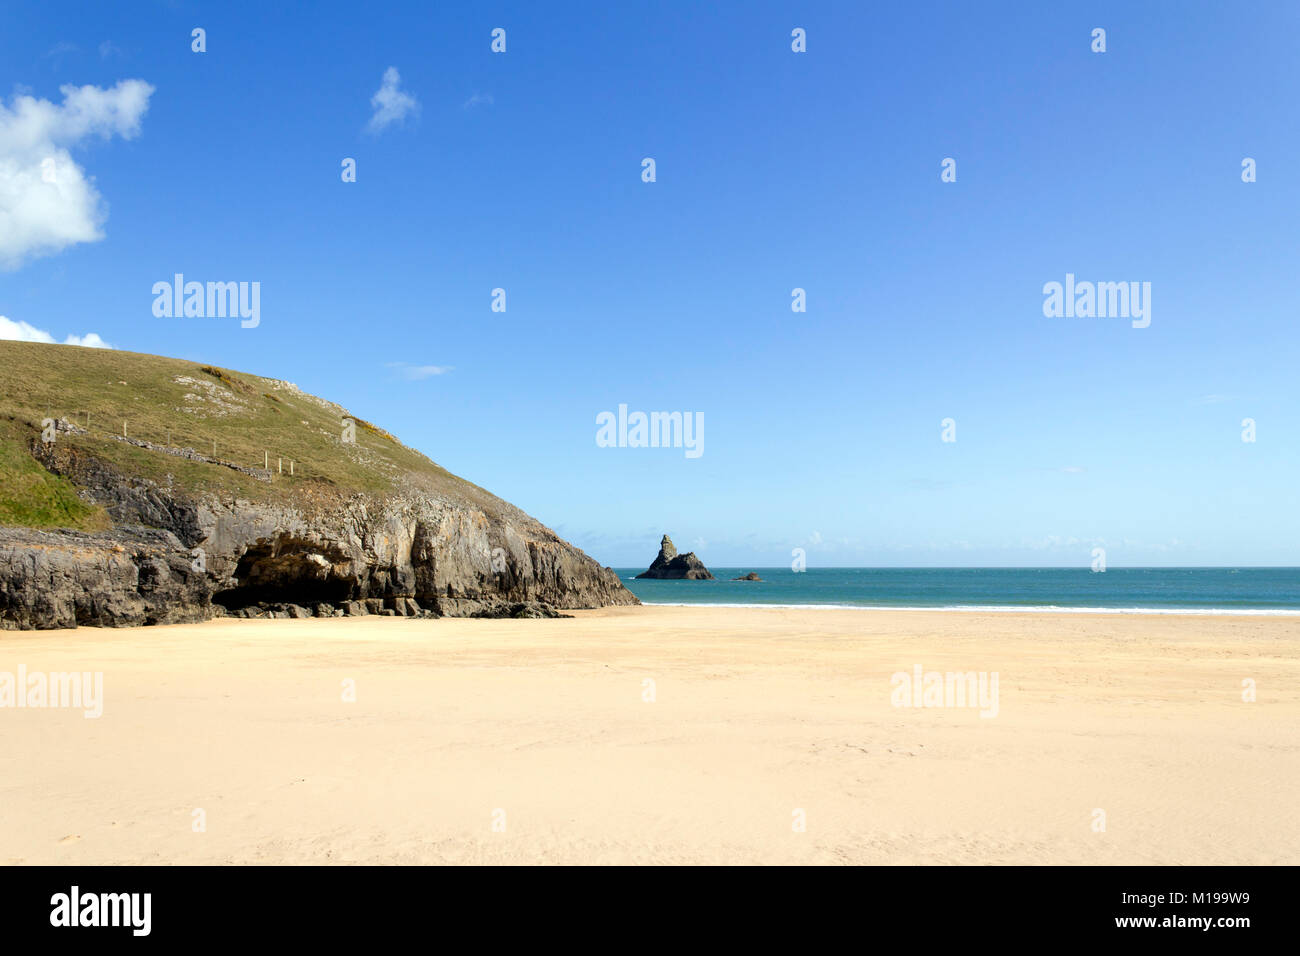 Idyllic Broad Haven South beach near Bosherston deserted in spring sunshine, Pembrokeshire, Wales, UK - Stock Image